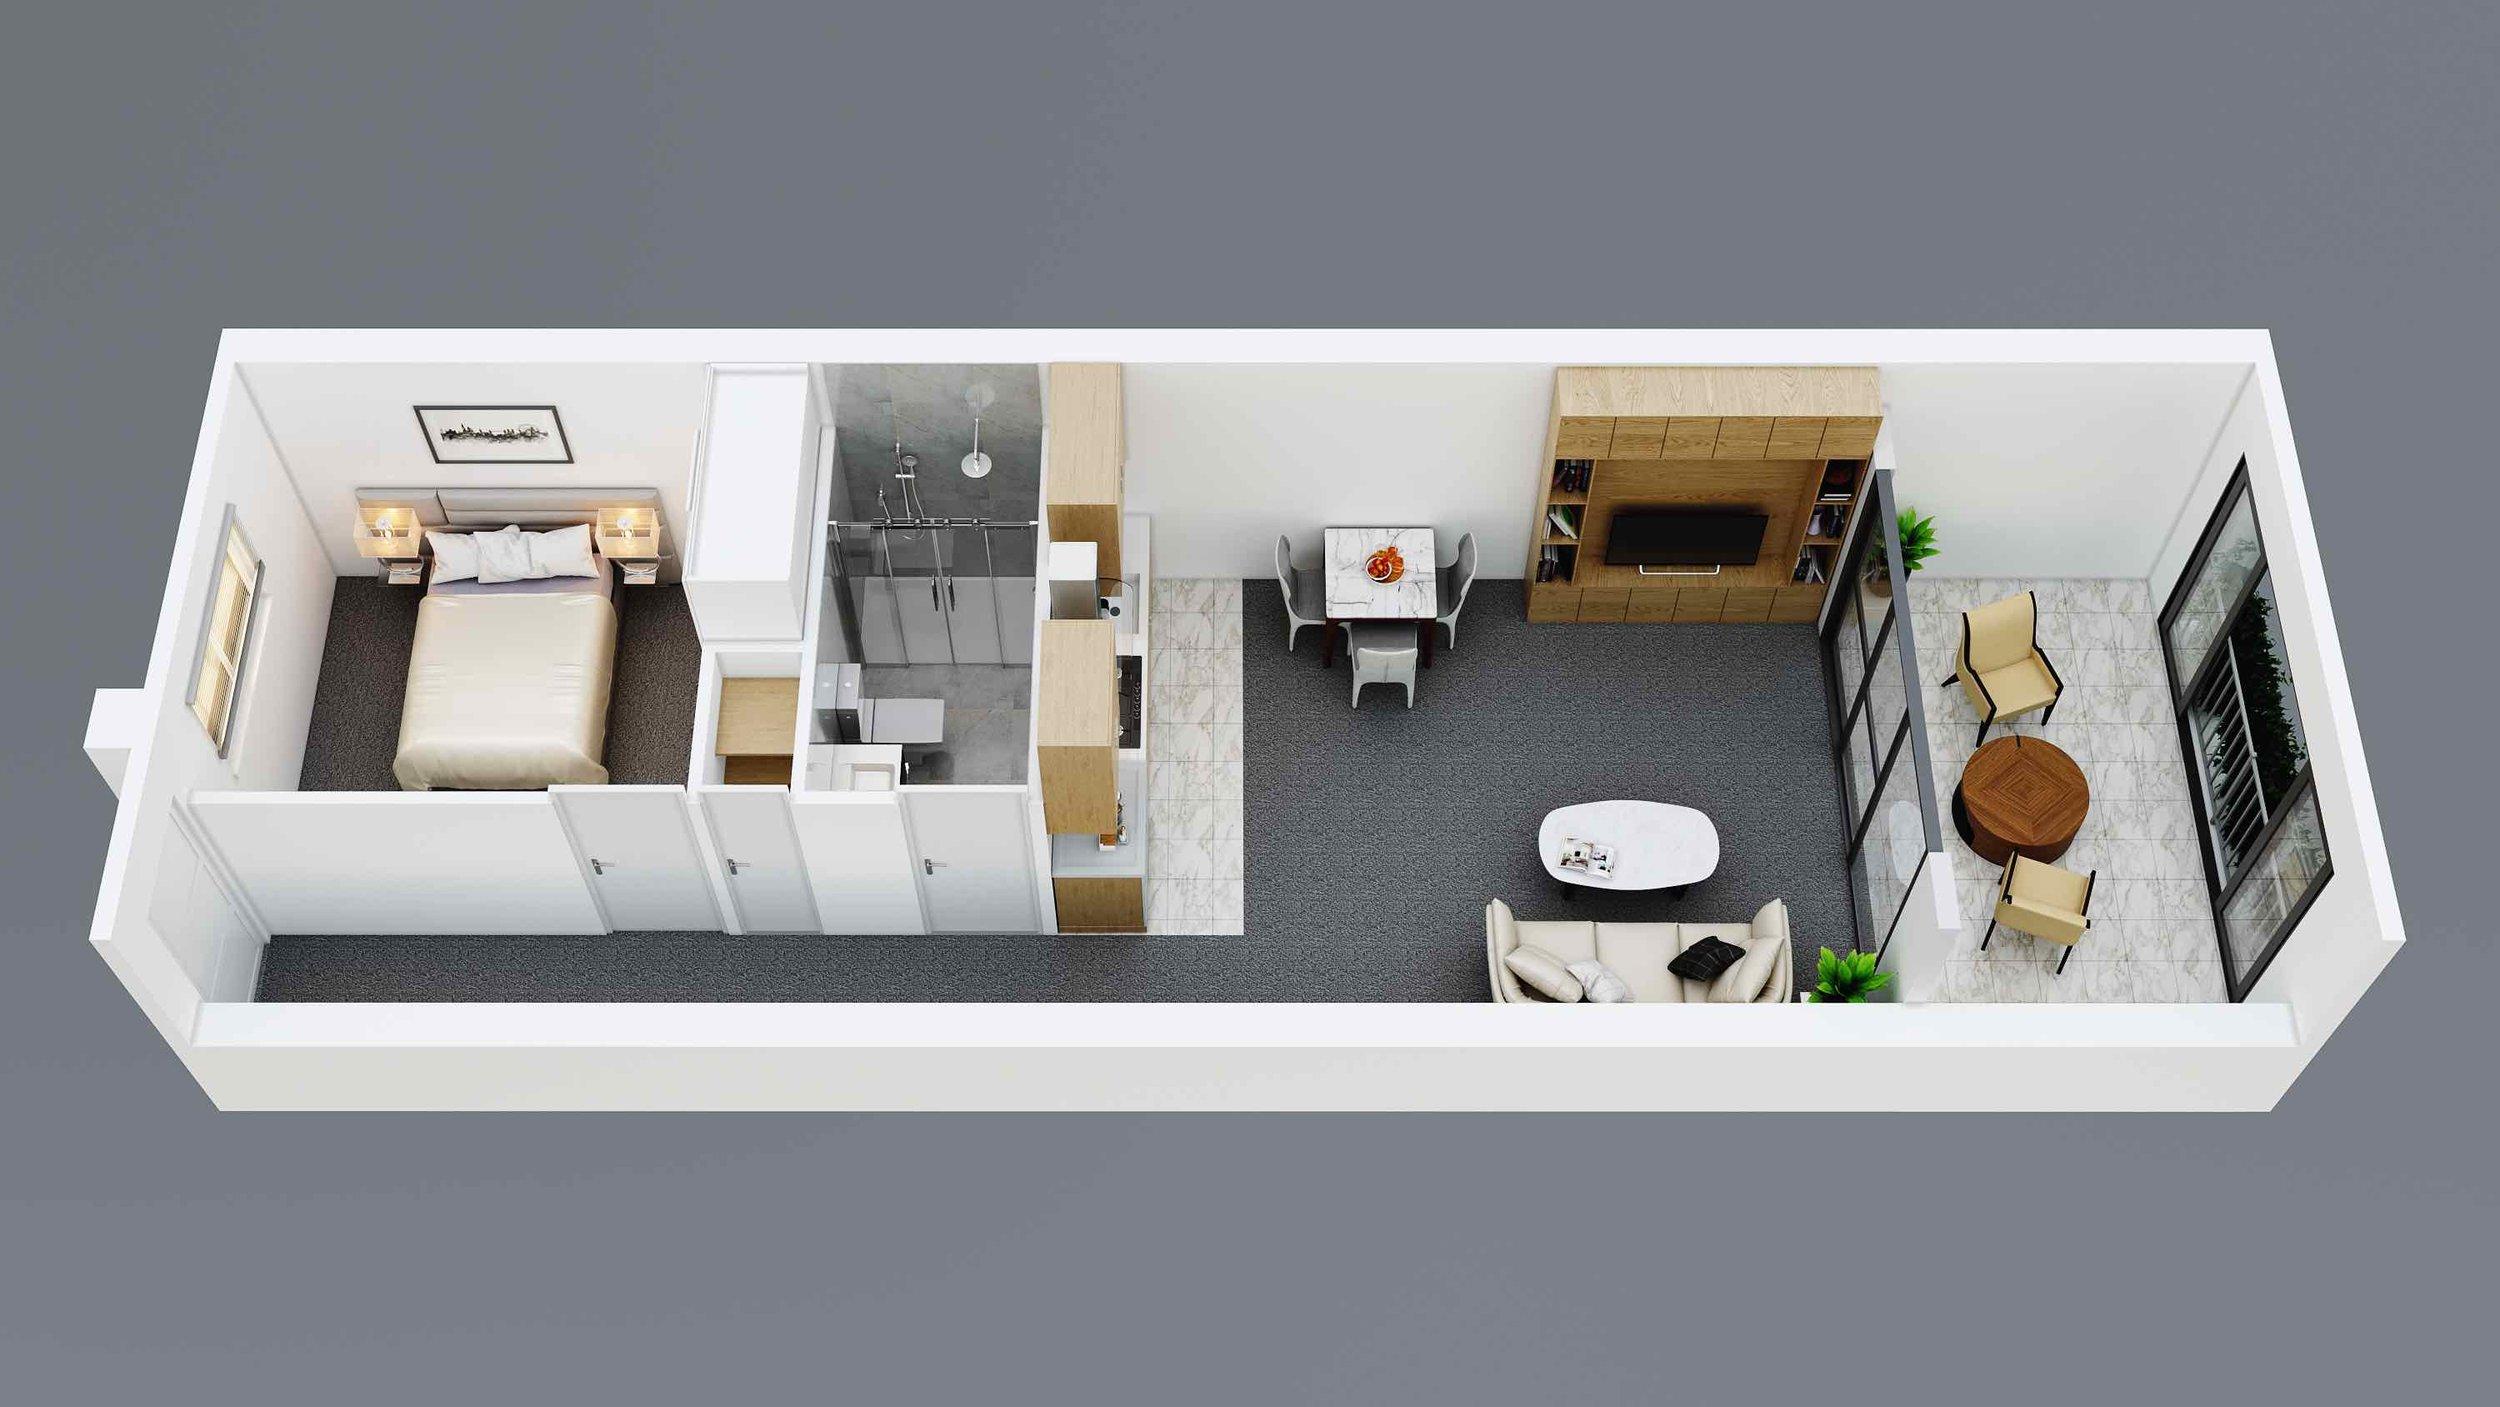 3 floor.jpg